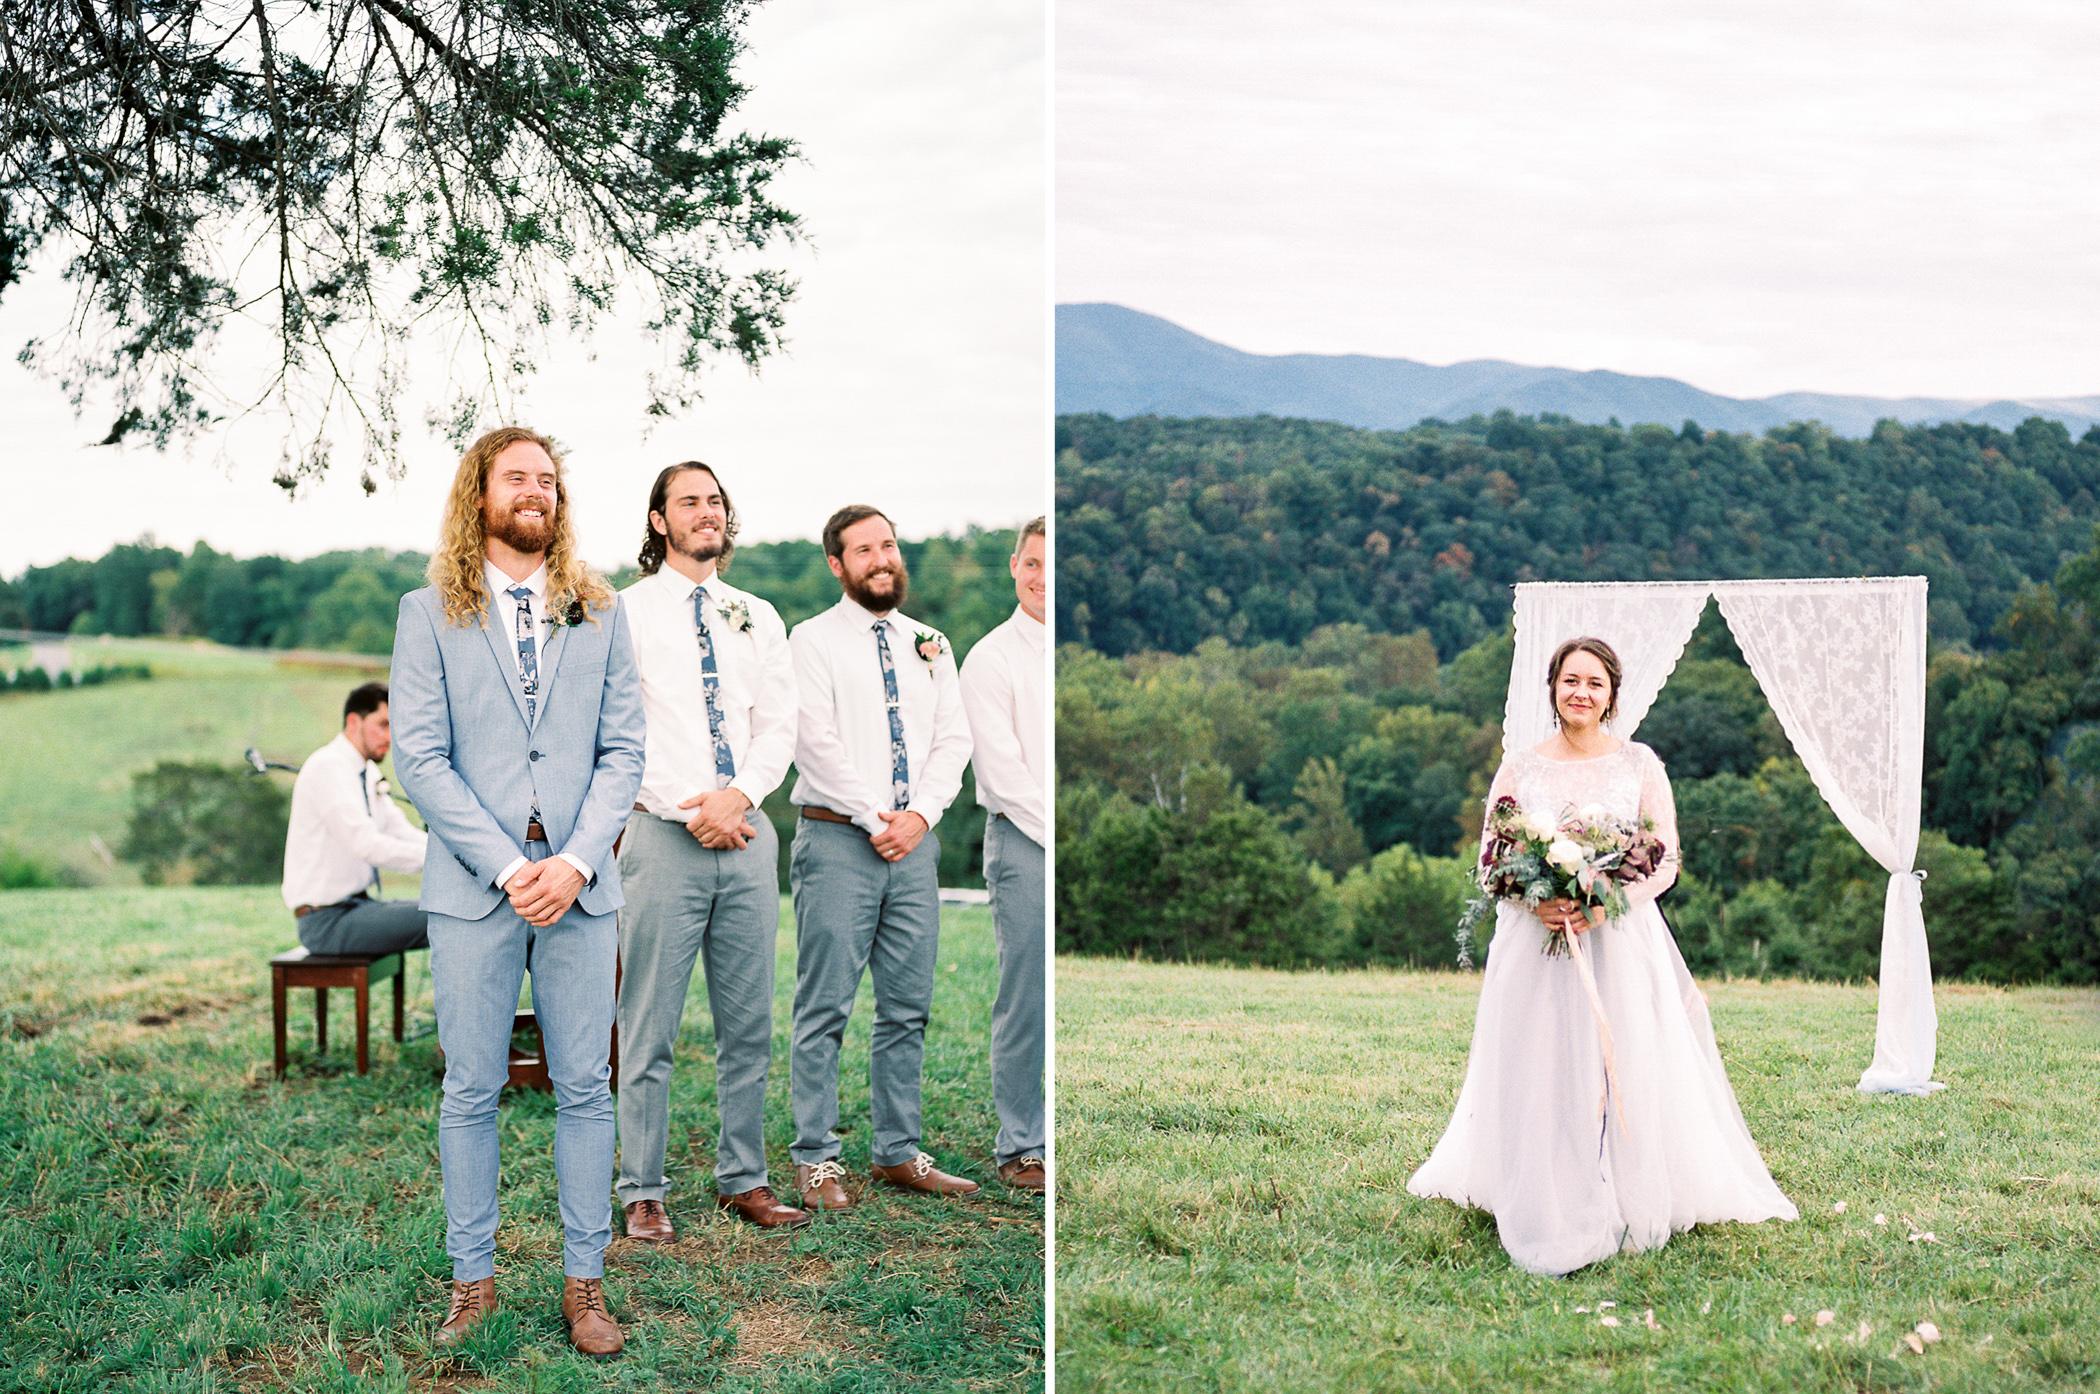 Charlotte-Film-Wedding_Photographer-heartstone-lodge-virginia-19.jpg